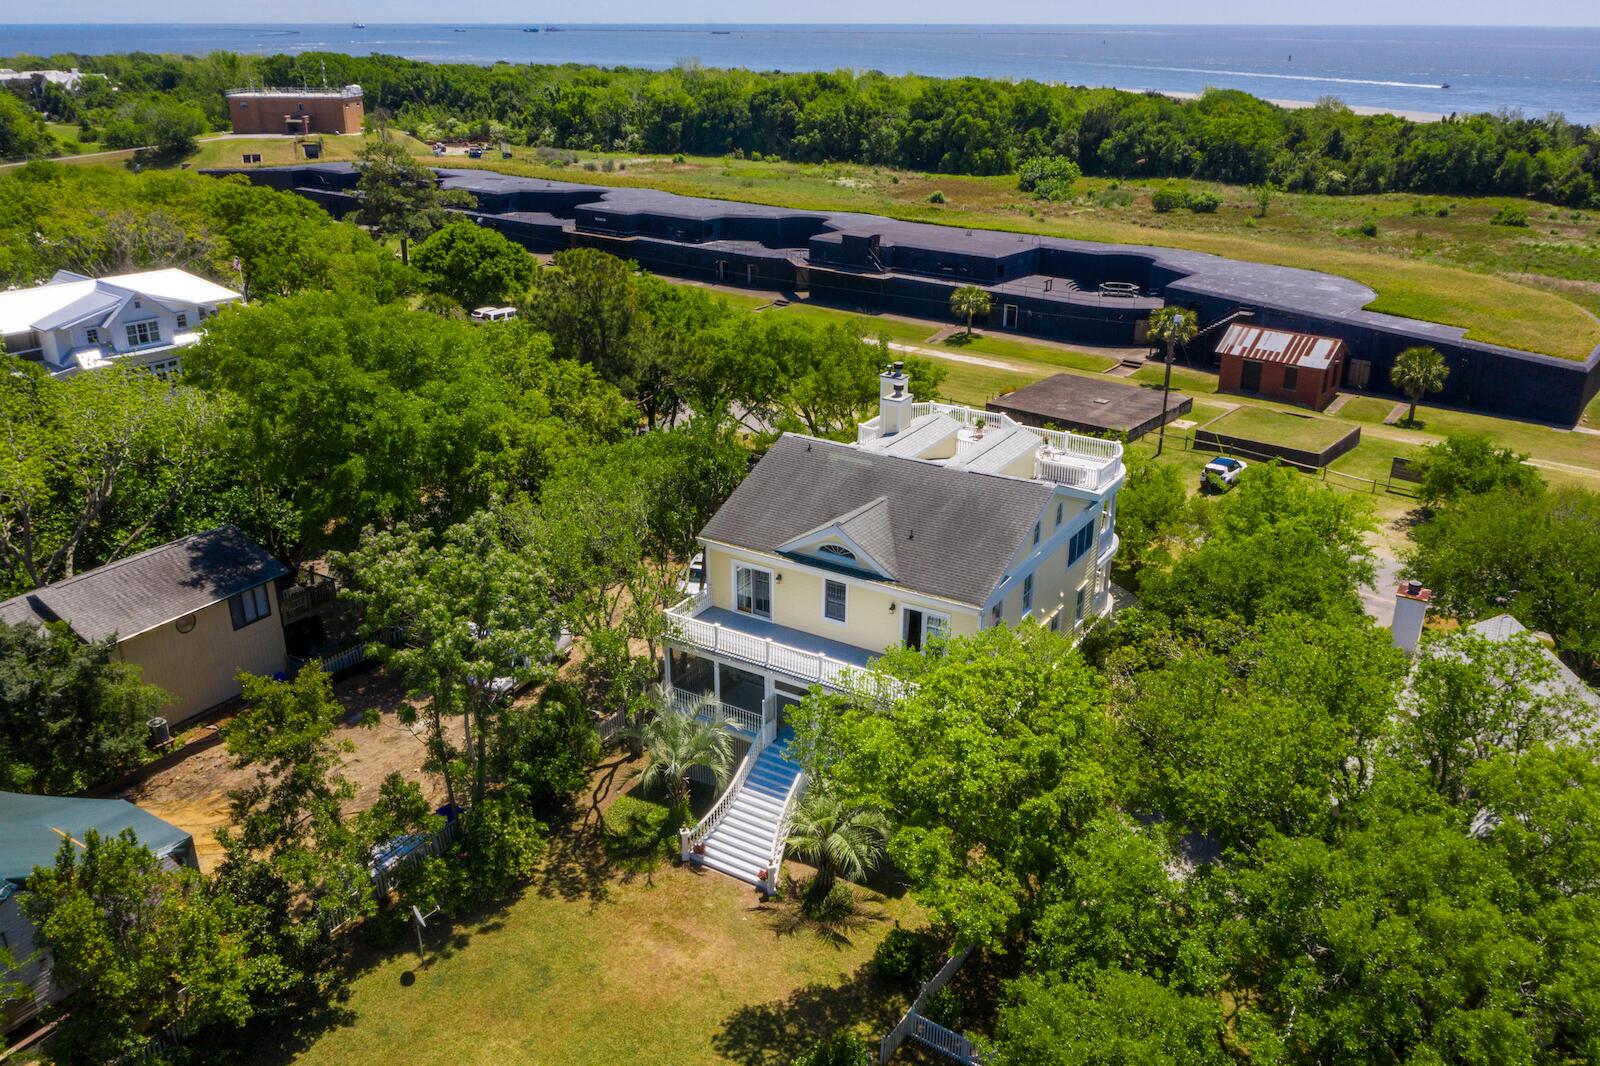 Sullivans Island Homes For Sale - 1318 Poe, Sullivans Island, SC - 16